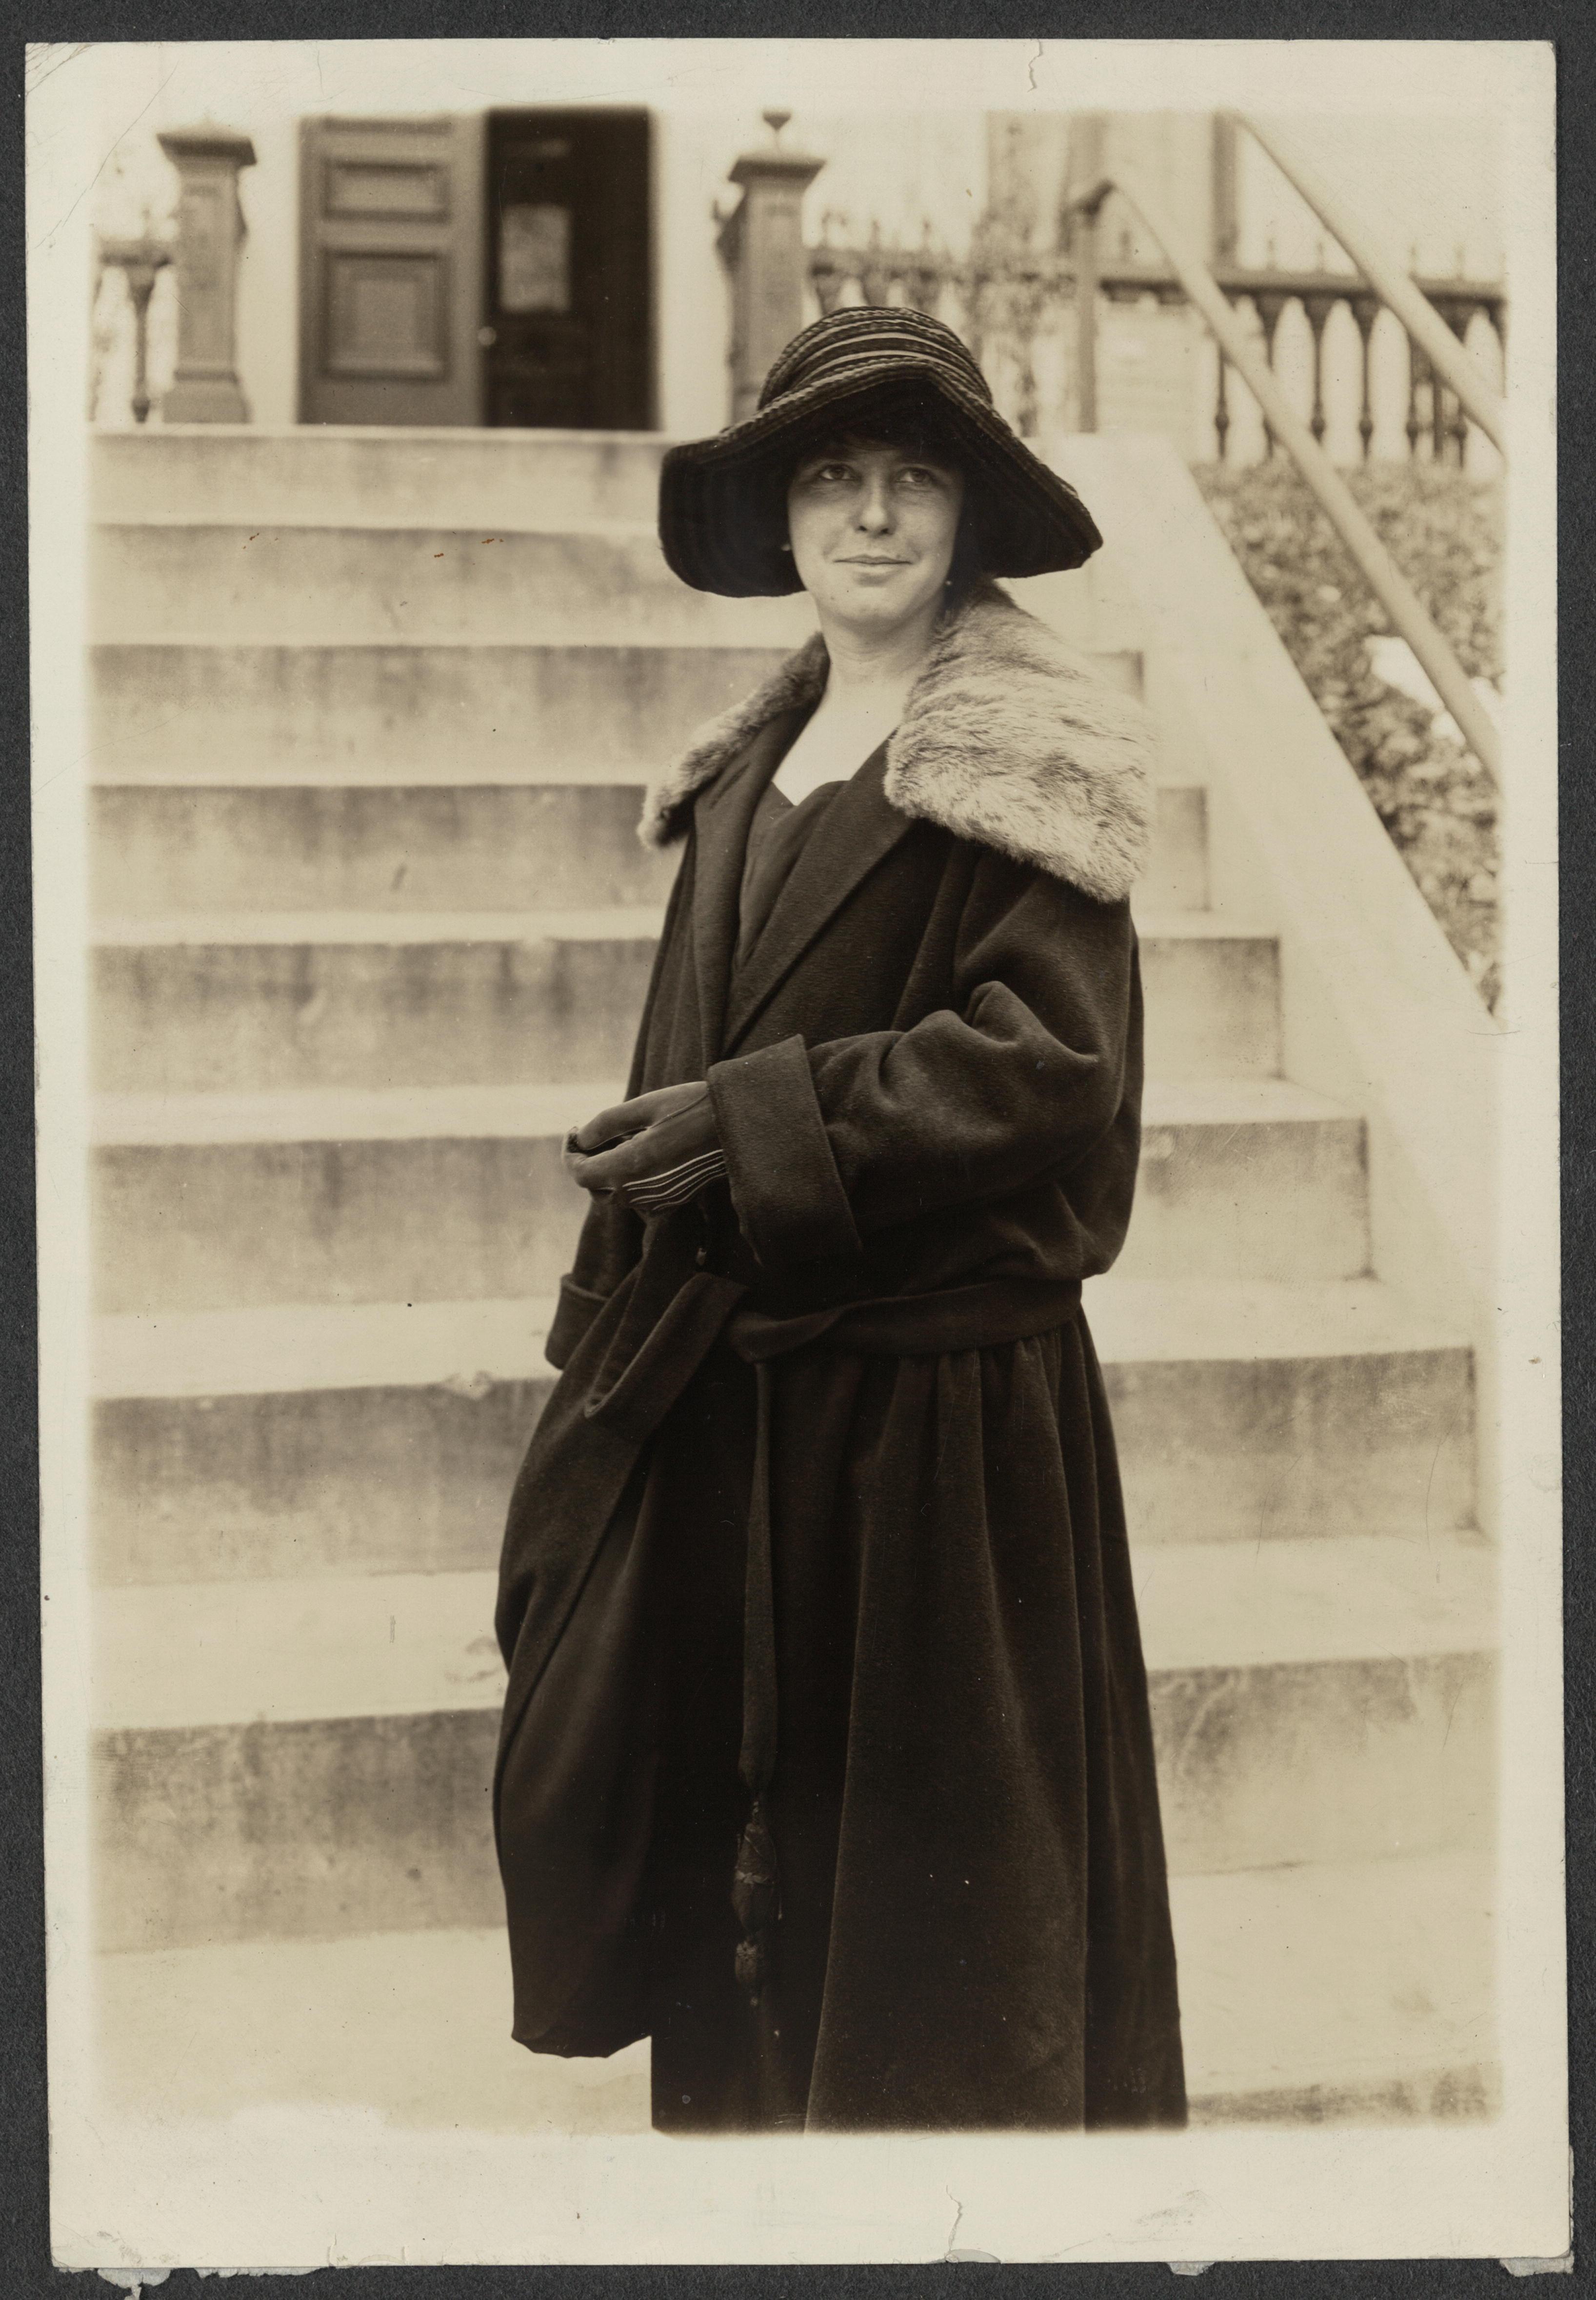 Image of Anita Pollitzer from Wikidata